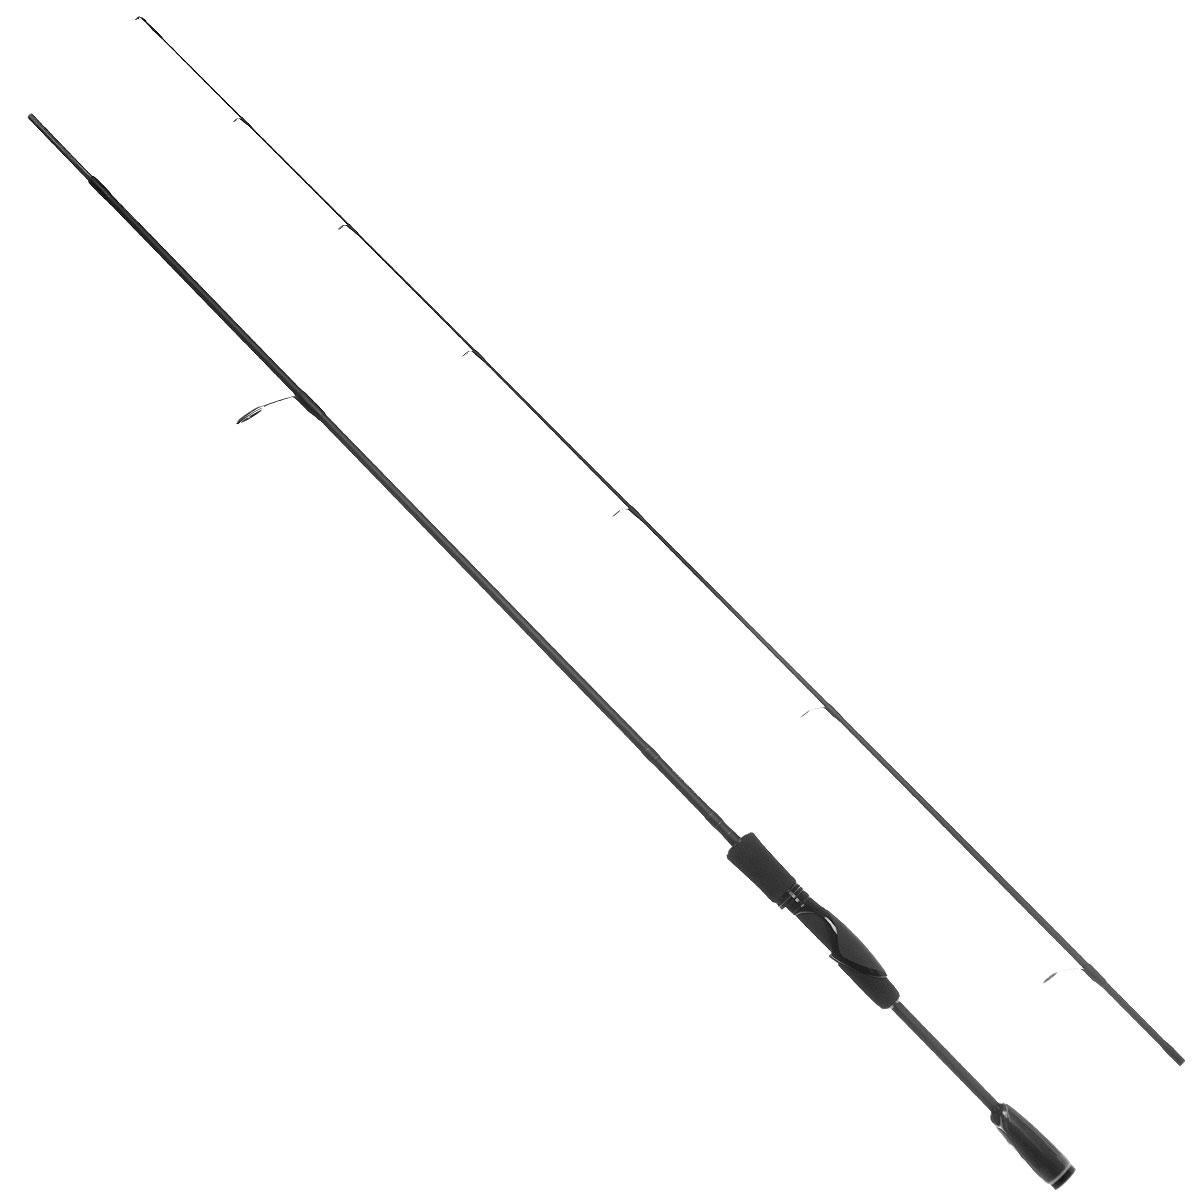 Спиннинг штекерный Daiwa Generation Black Small Plugger, 2,25 м, 5-12 г